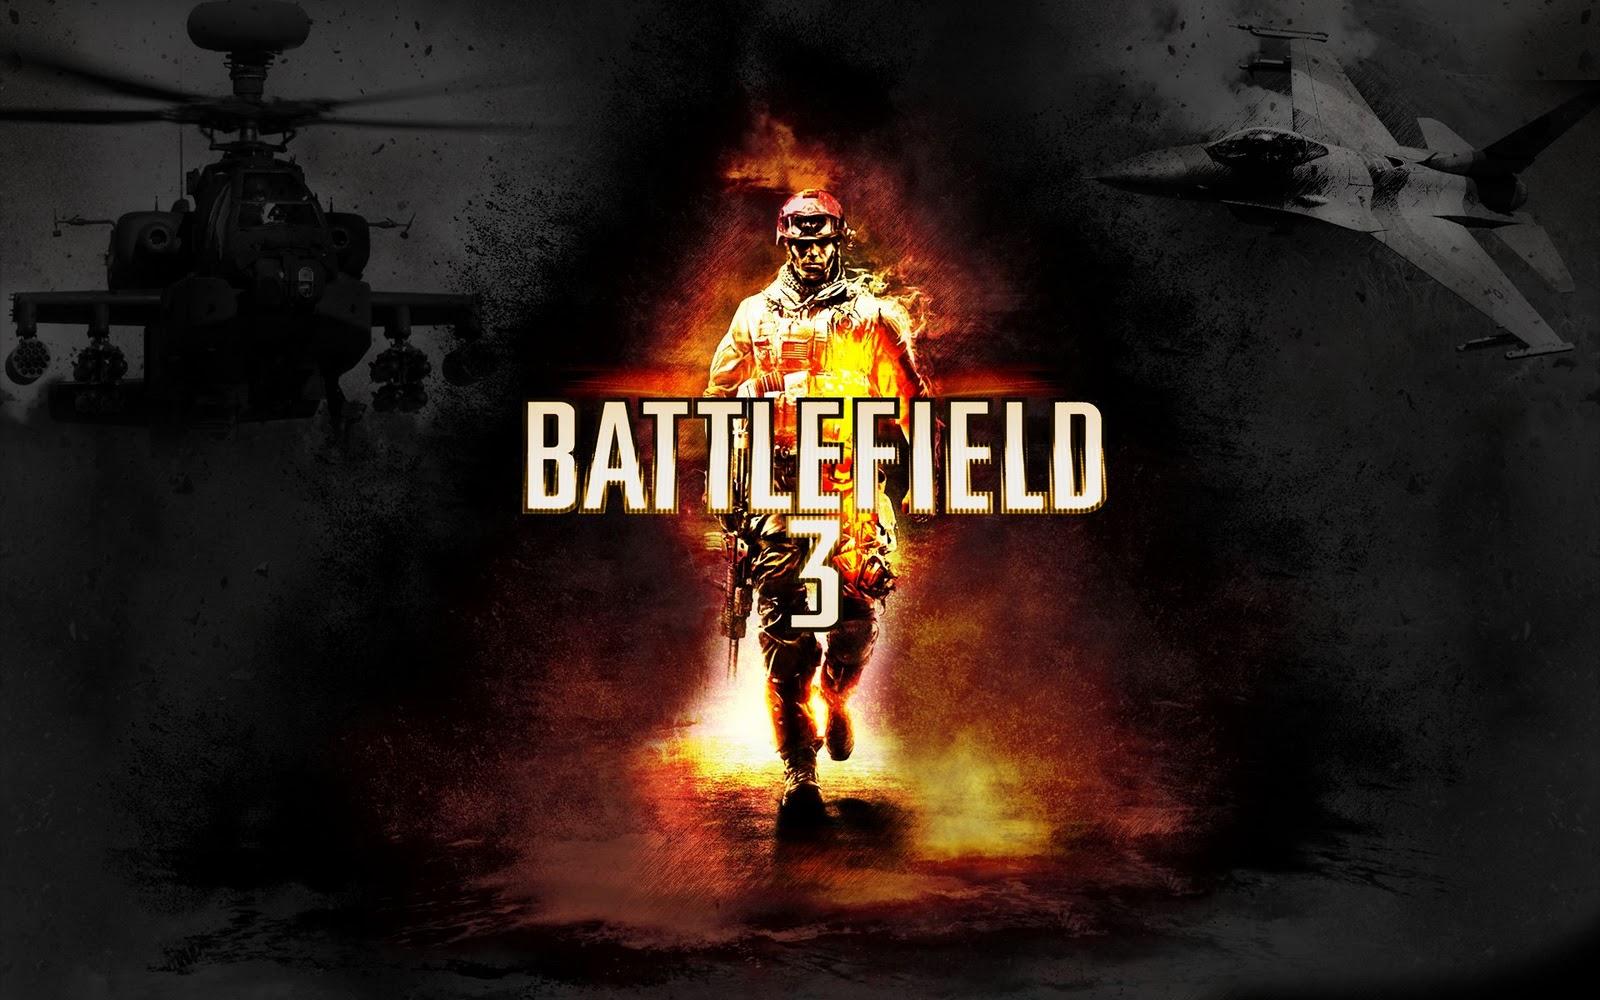 http://1.bp.blogspot.com/-nwPuub8_j9U/TqP1mKD6x8I/AAAAAAAAABg/ALOkRvvV8jA/s1600/battlefield-3-wallpaper-by-slicer4killer_2.jpg